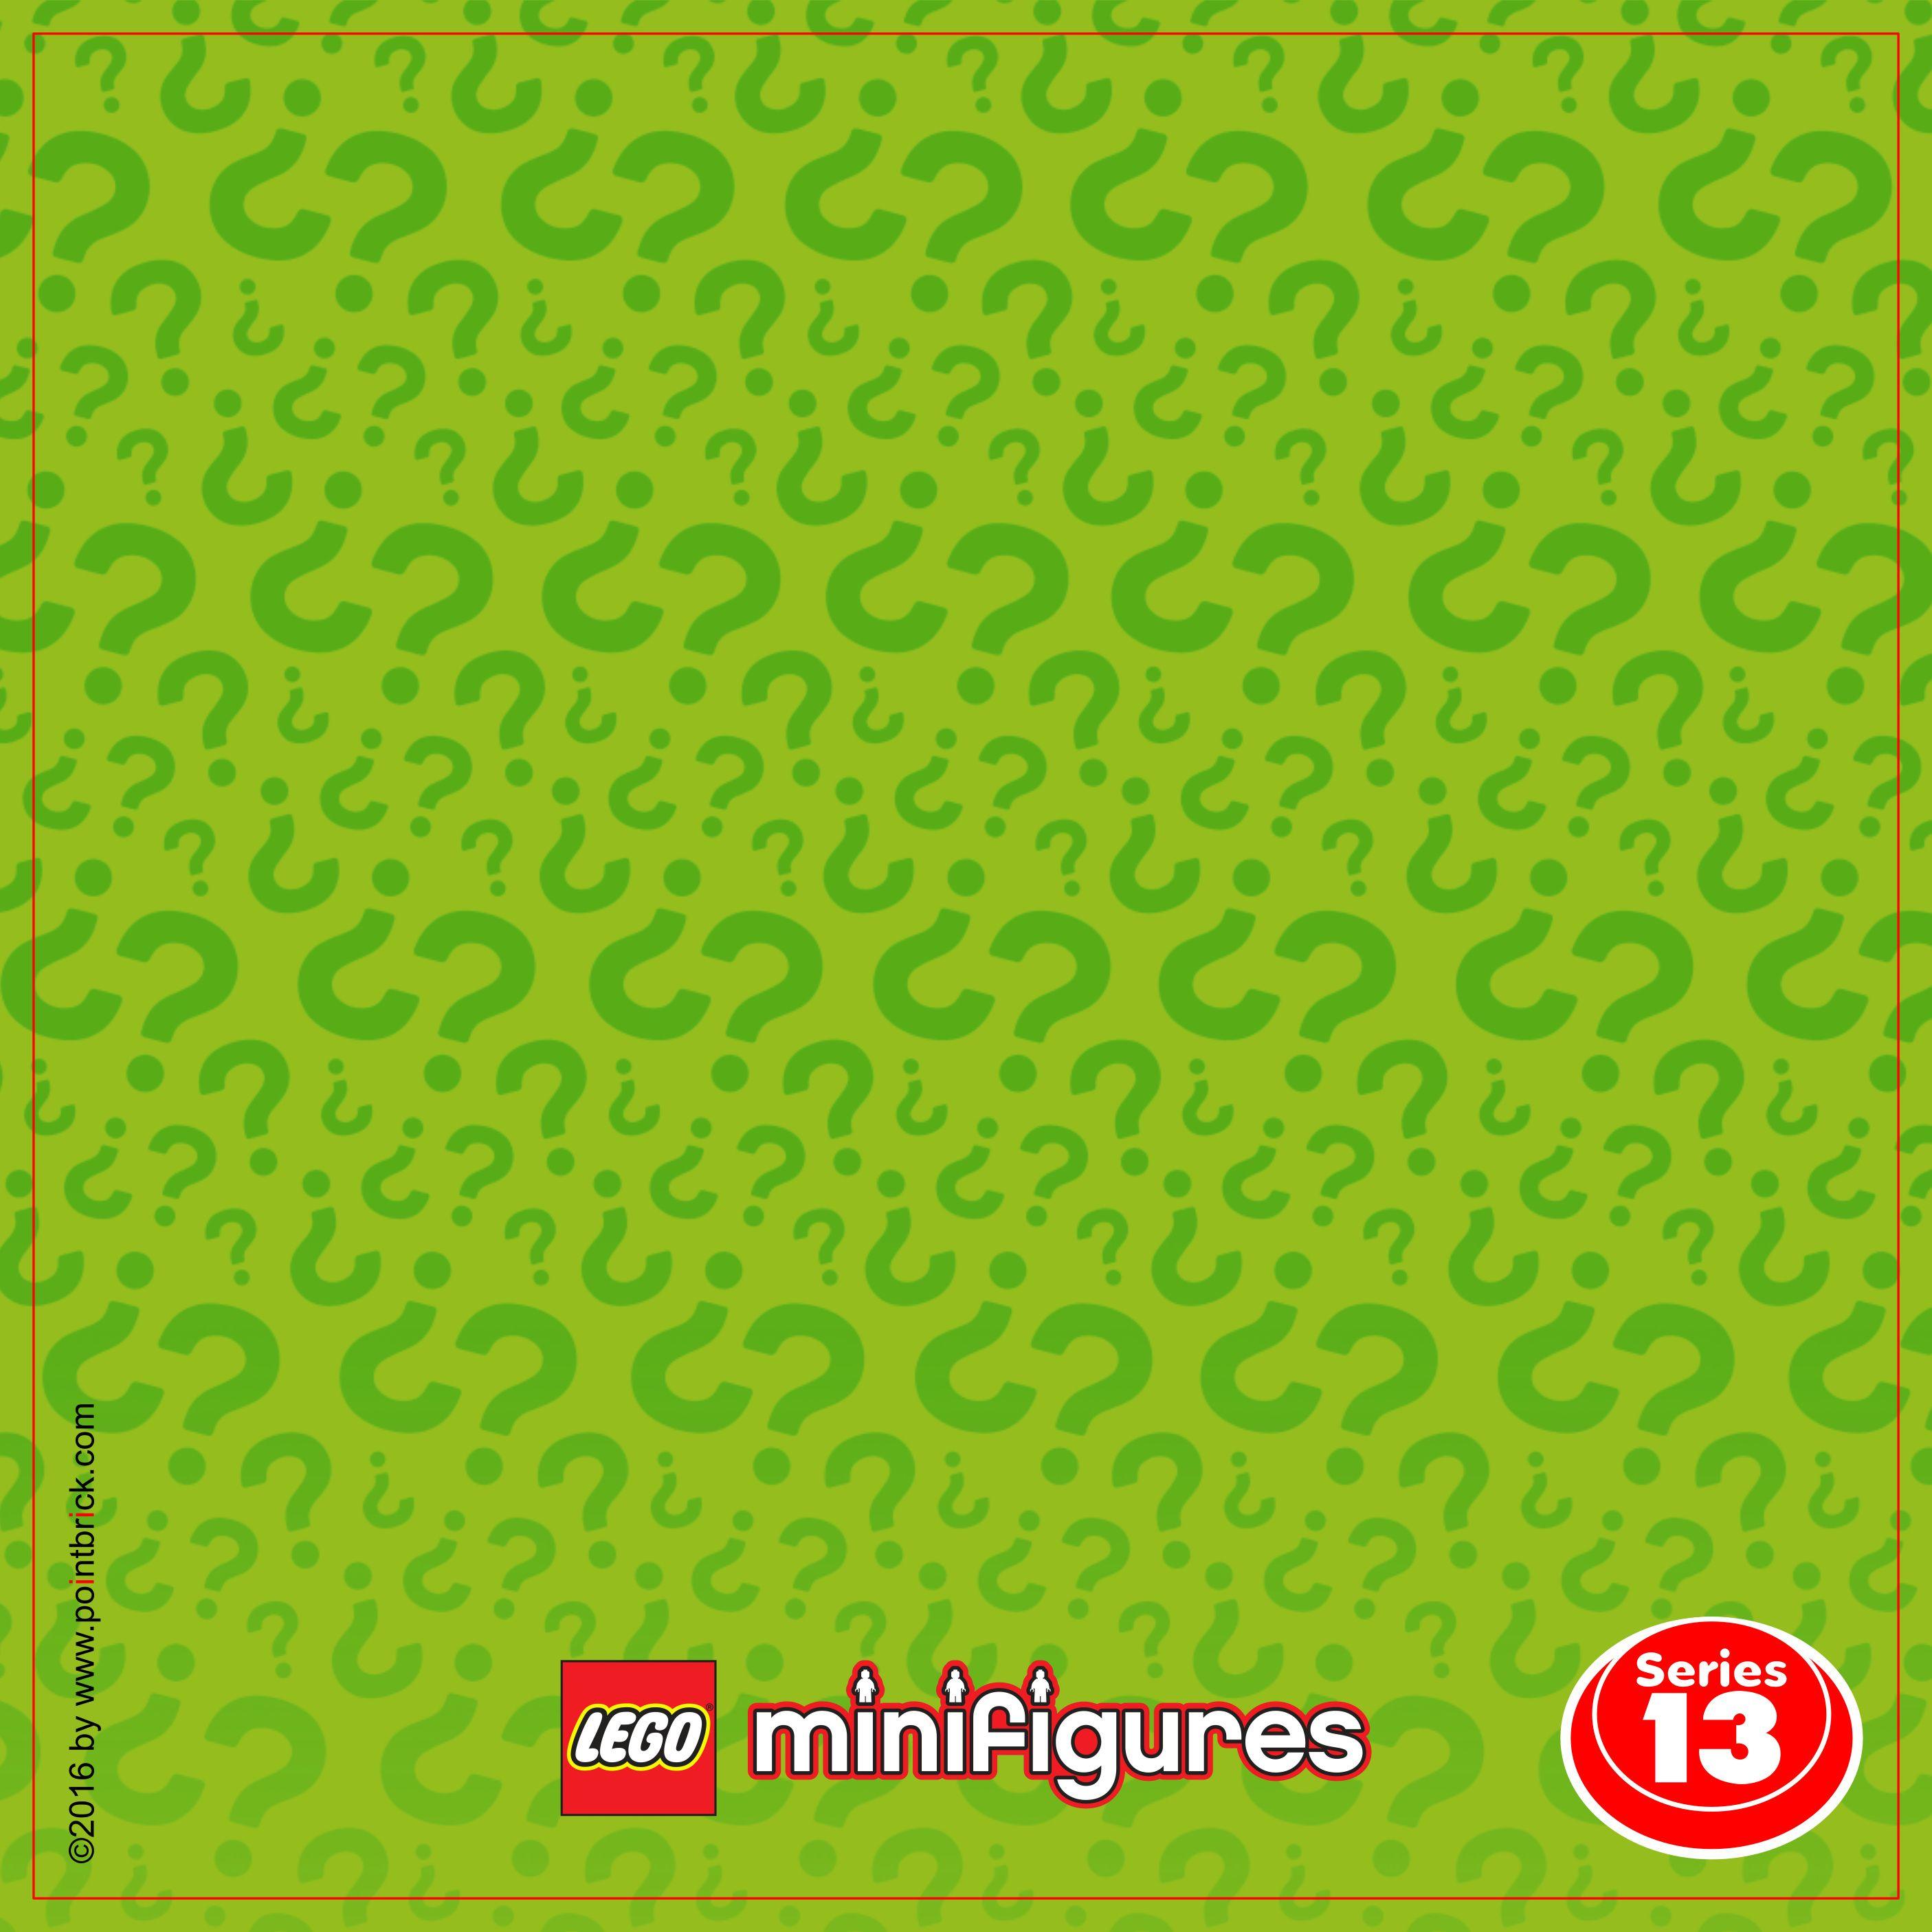 LEGO Minifigures Display: Sfondi Serie 12 e 13